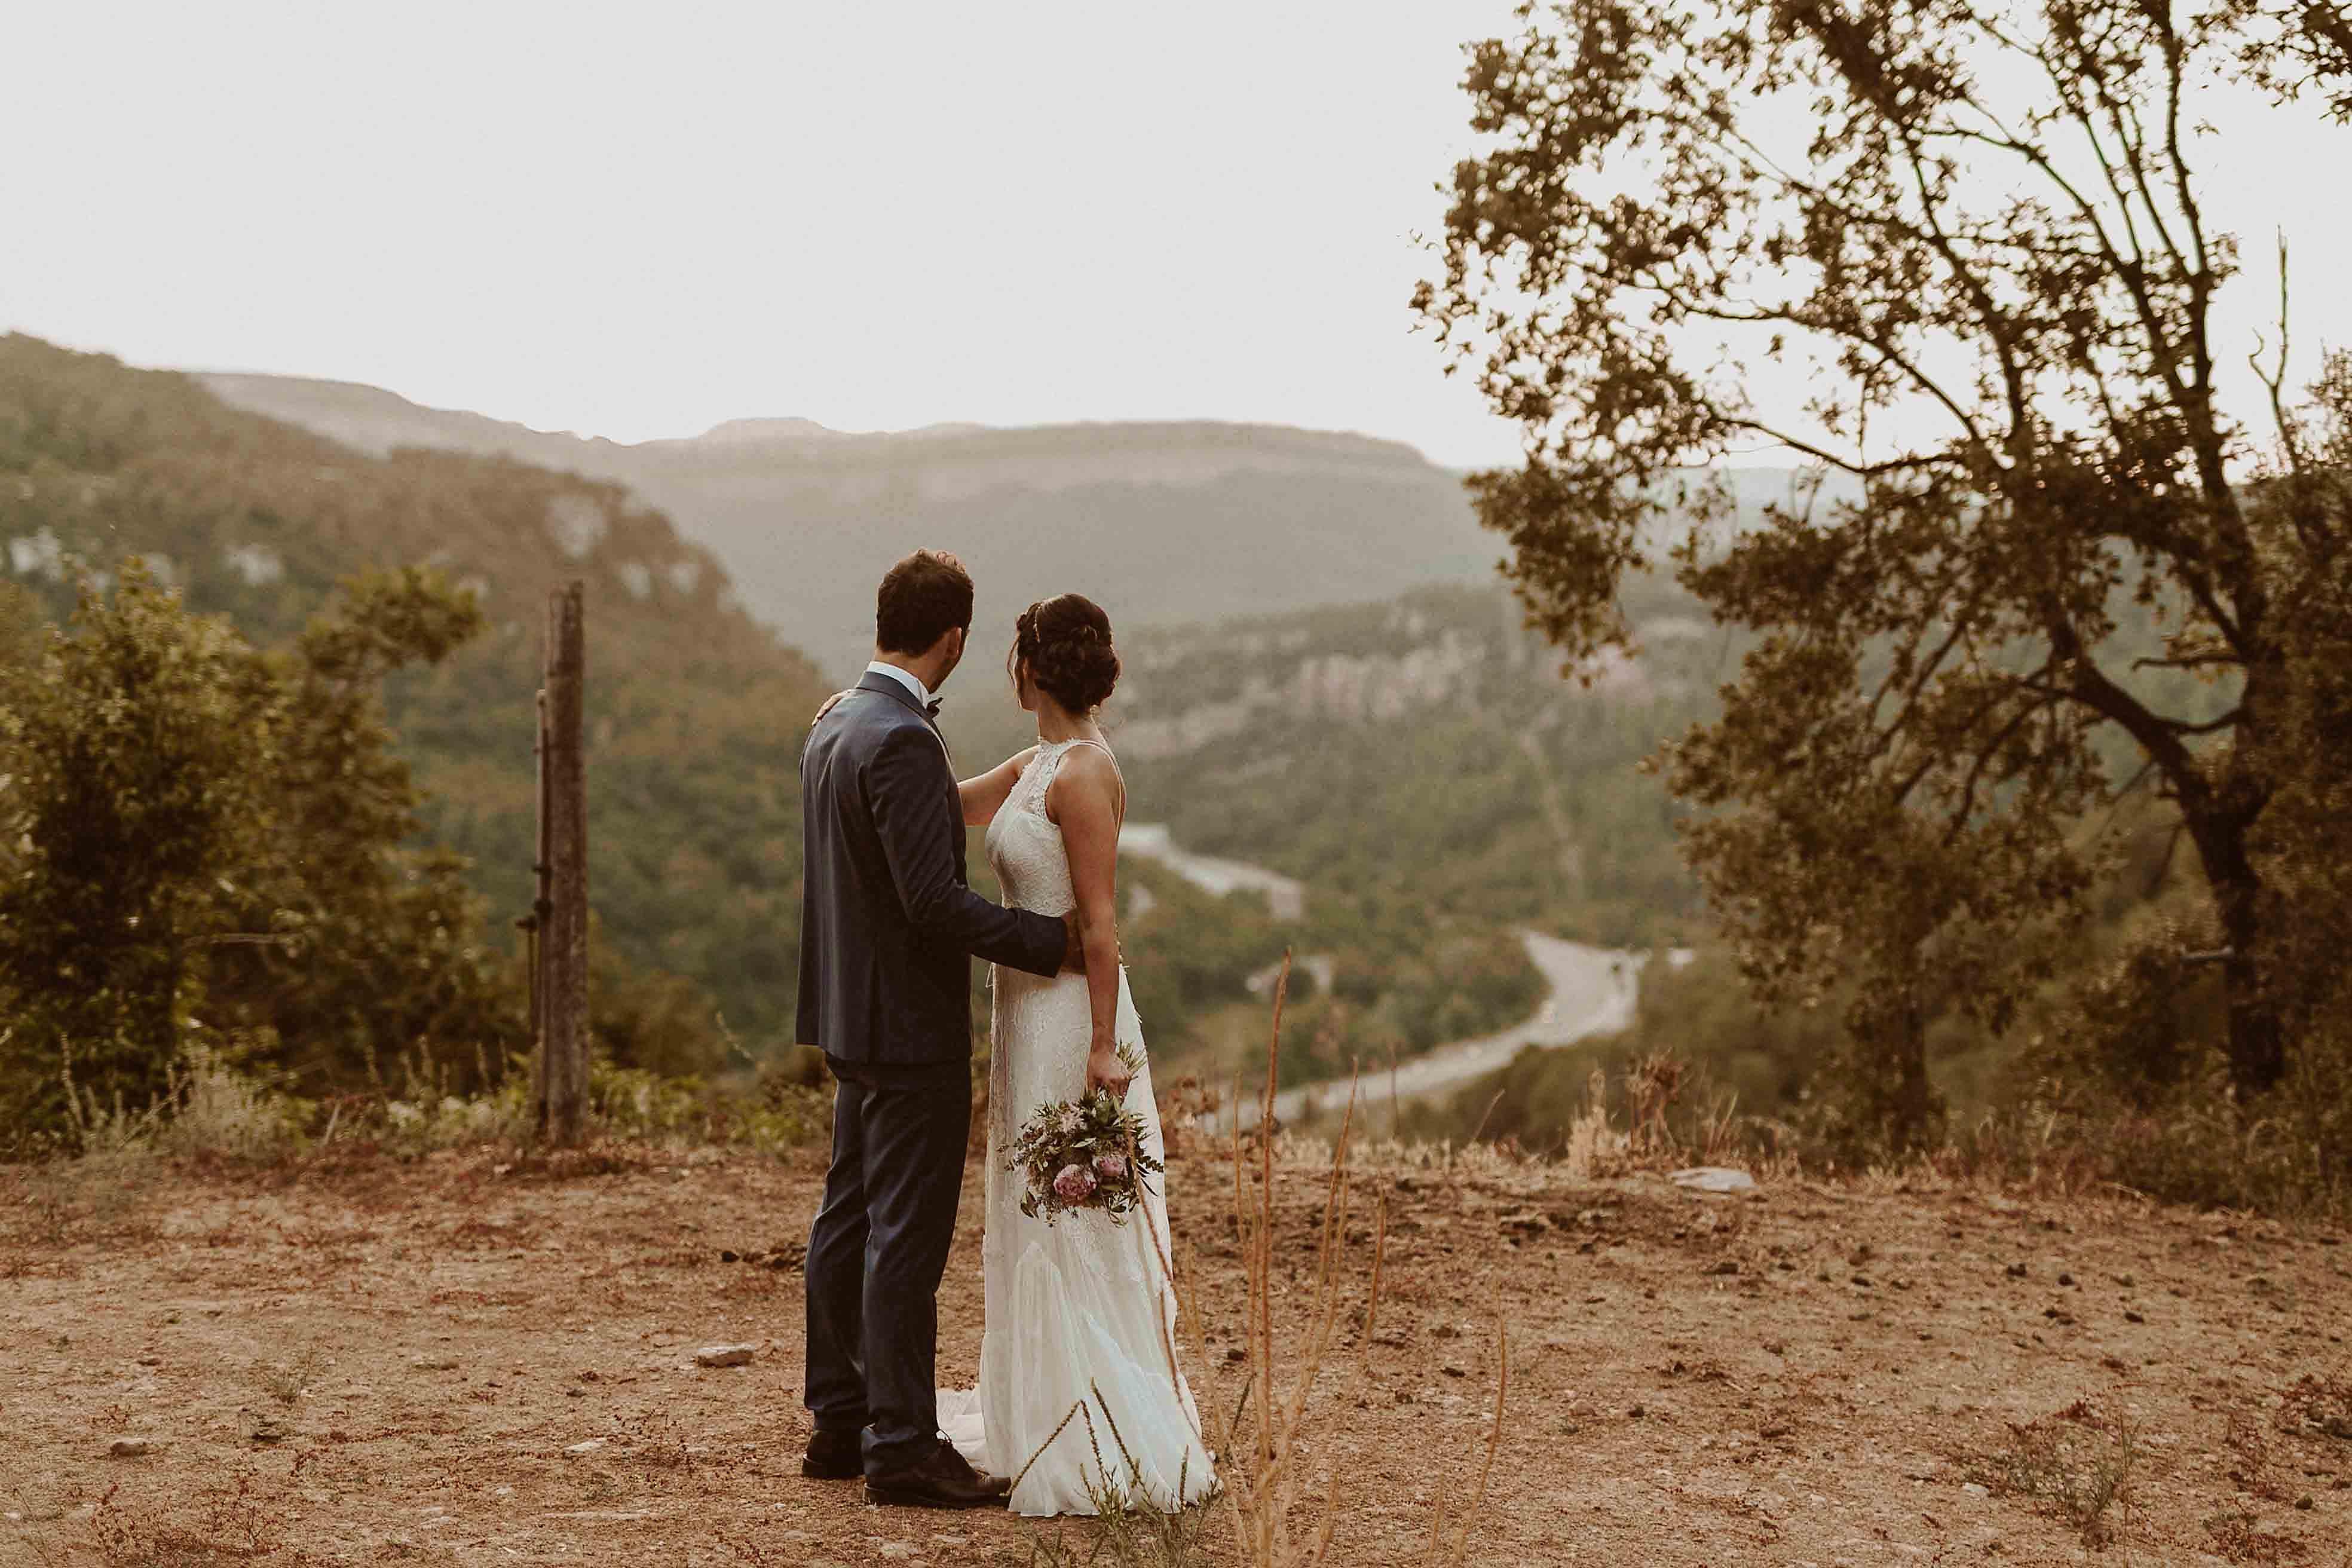 Boda rústica en la montaña. fotgrafo de bodas barcelona_088